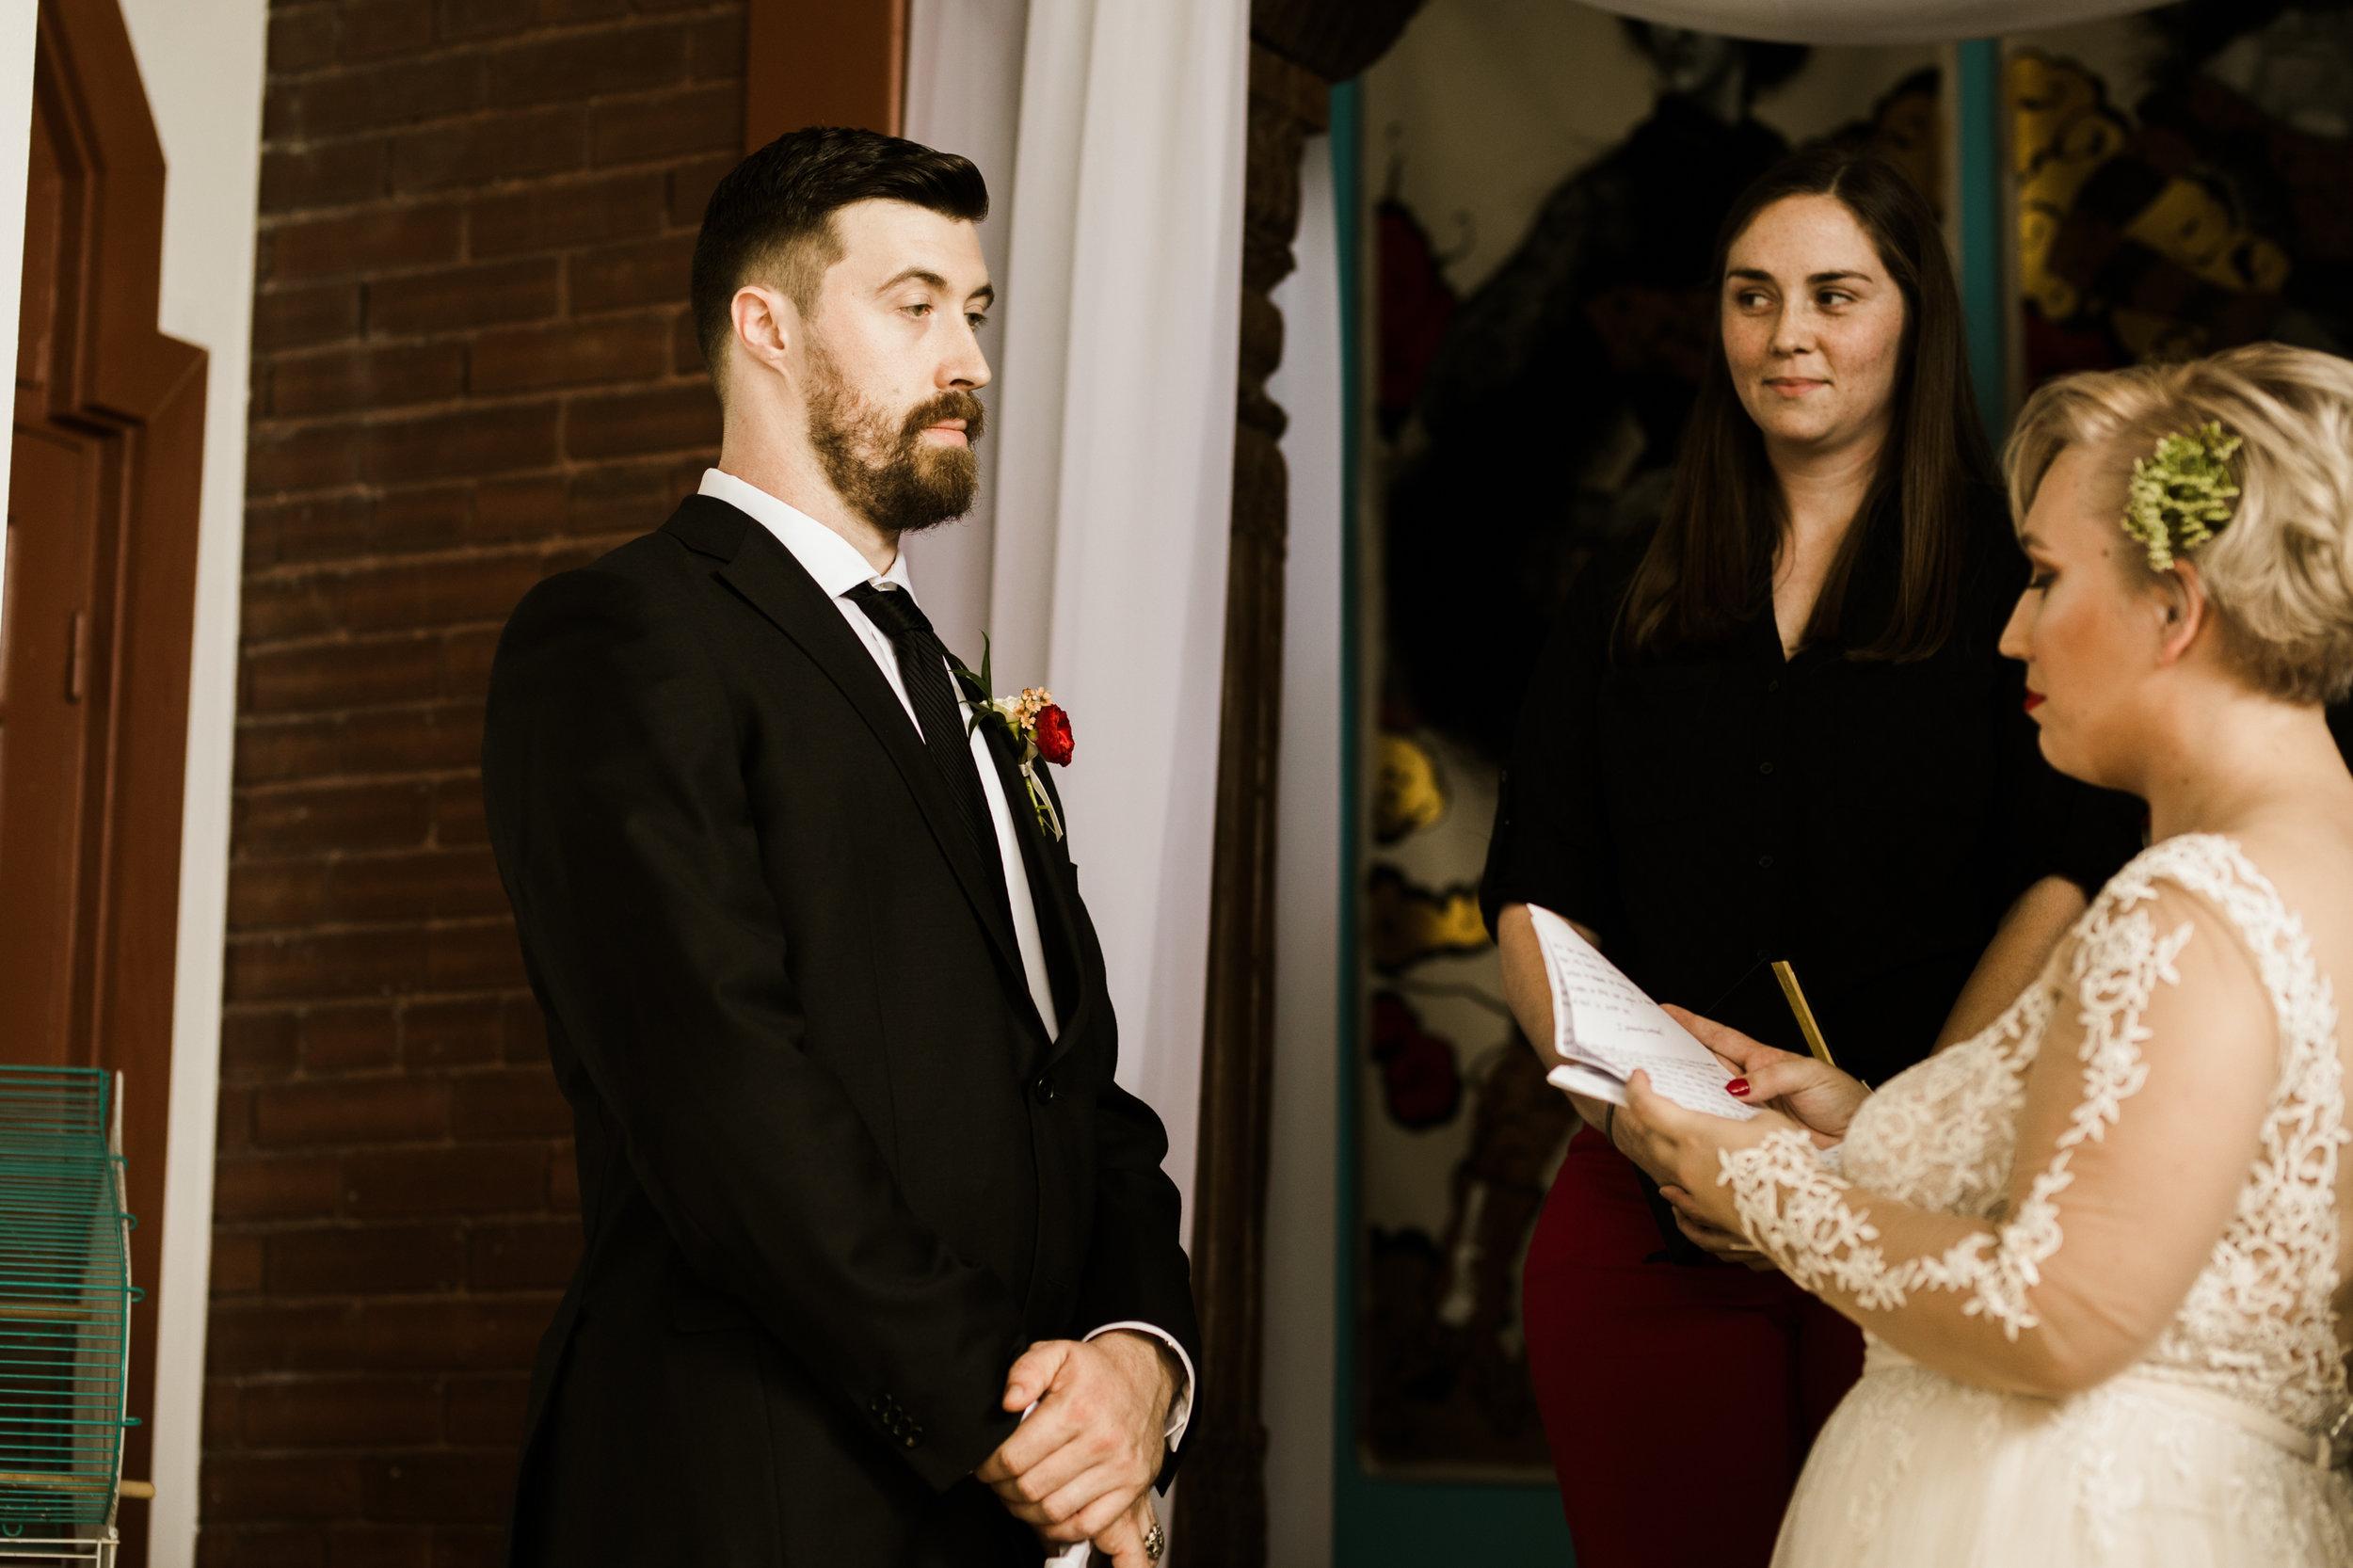 Kentucky Wedding Louisville Wedding Photographer 2018 Crystal Ludwick Photo Louisville Wedding Photographer Kentucky Wedding Photographer (32 of 105).jpg